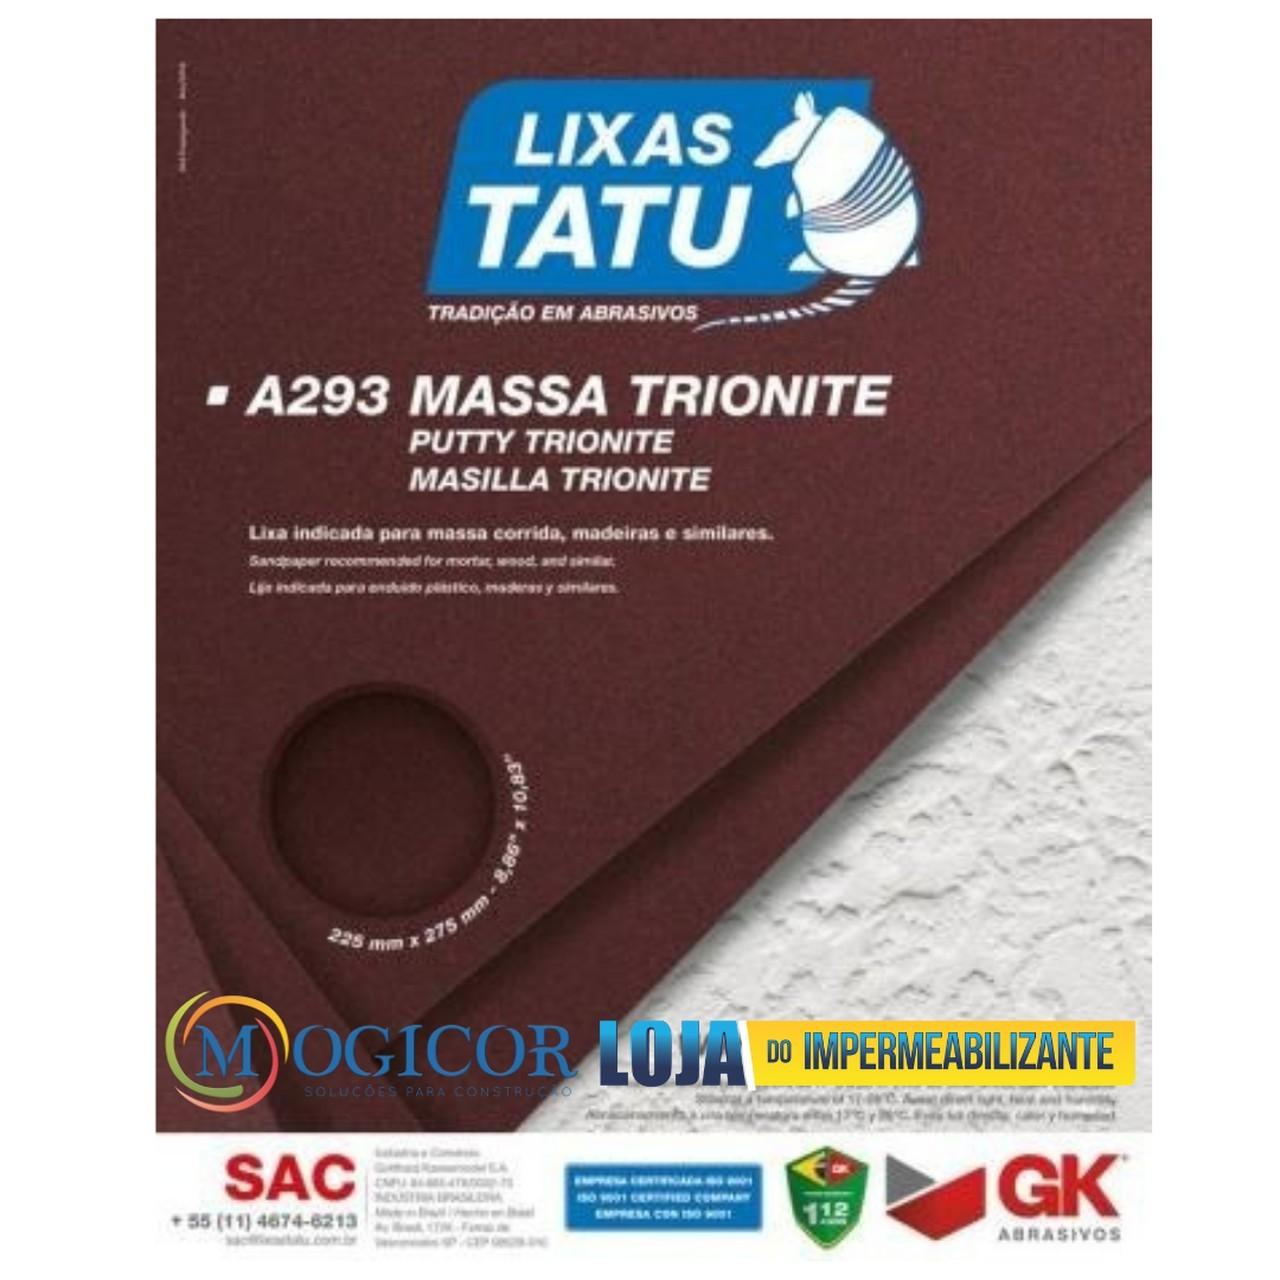 Kit 50un Lixa para Massa Corrida, Rebocos, Argamassas e Gesso - Tatu